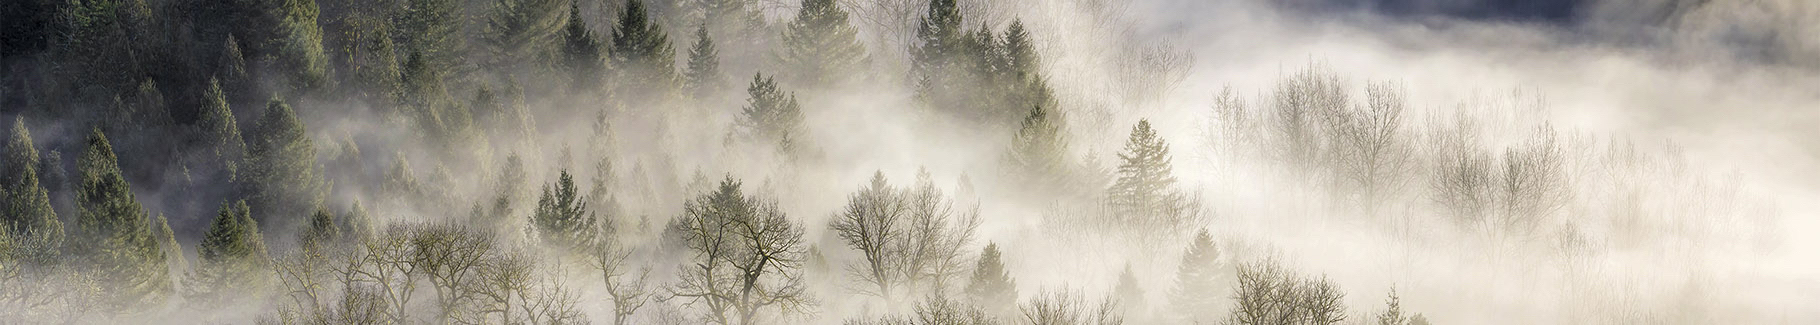 Fototapeta poranna mgła